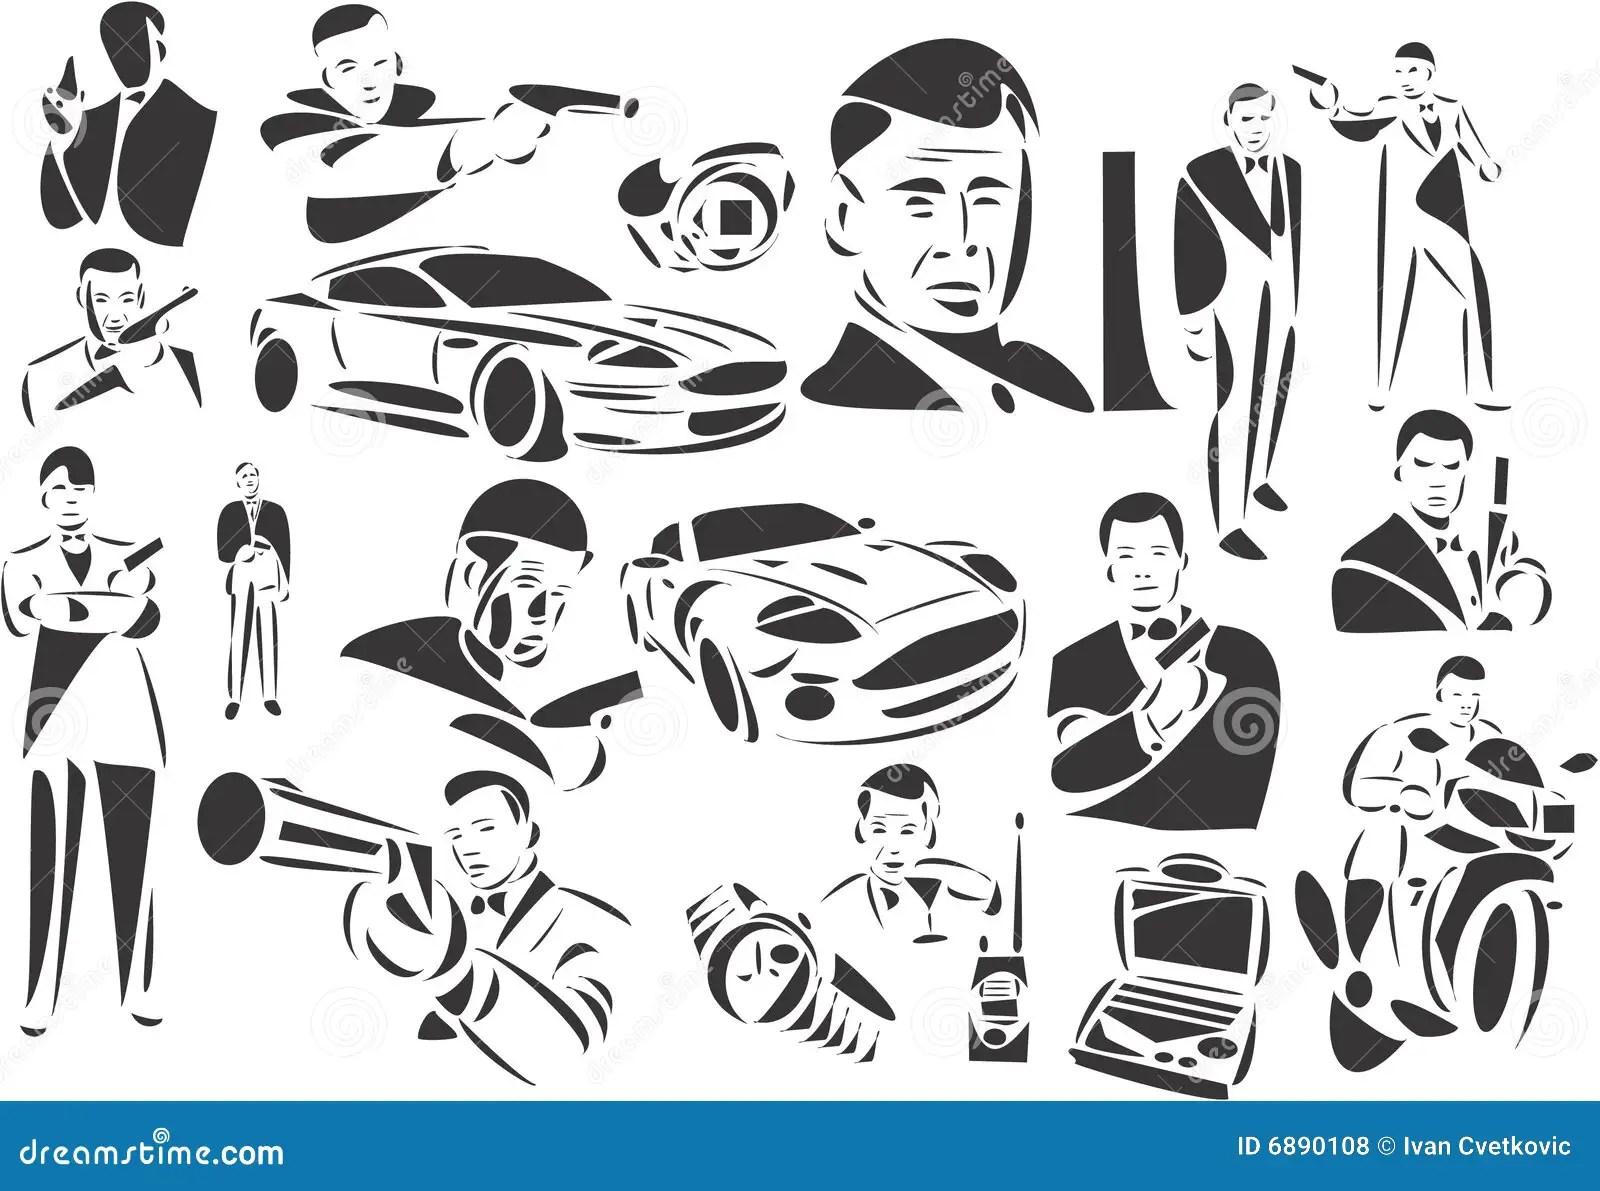 James Bond Royalty Free Stock Photos